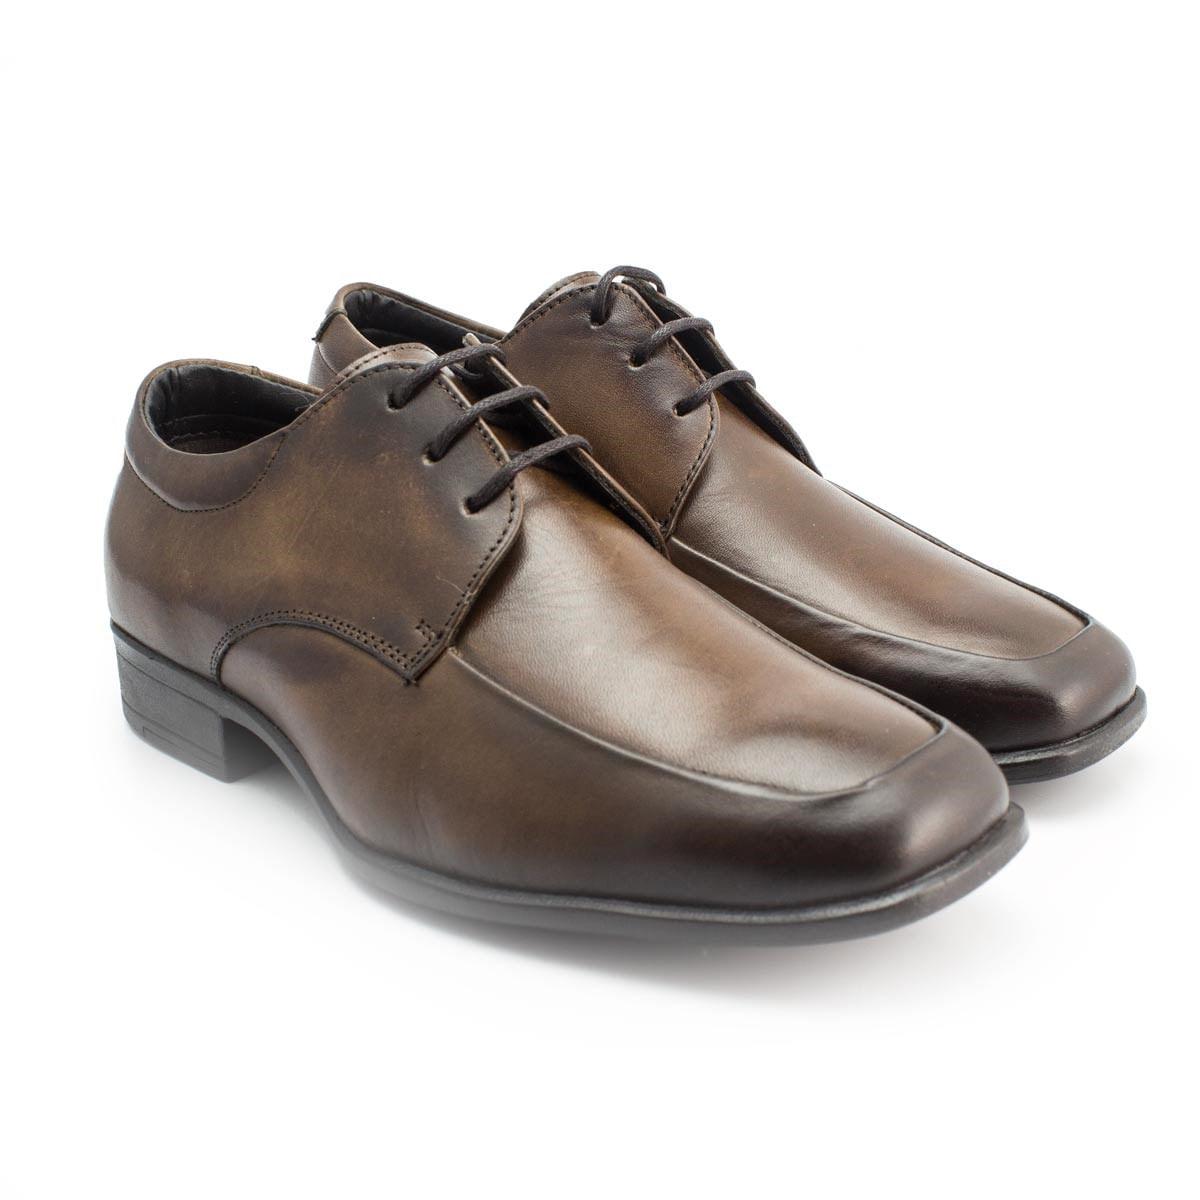 Sapato-social-infantil-de-amarrar-Ludique-et-Badin--26-ao-37-